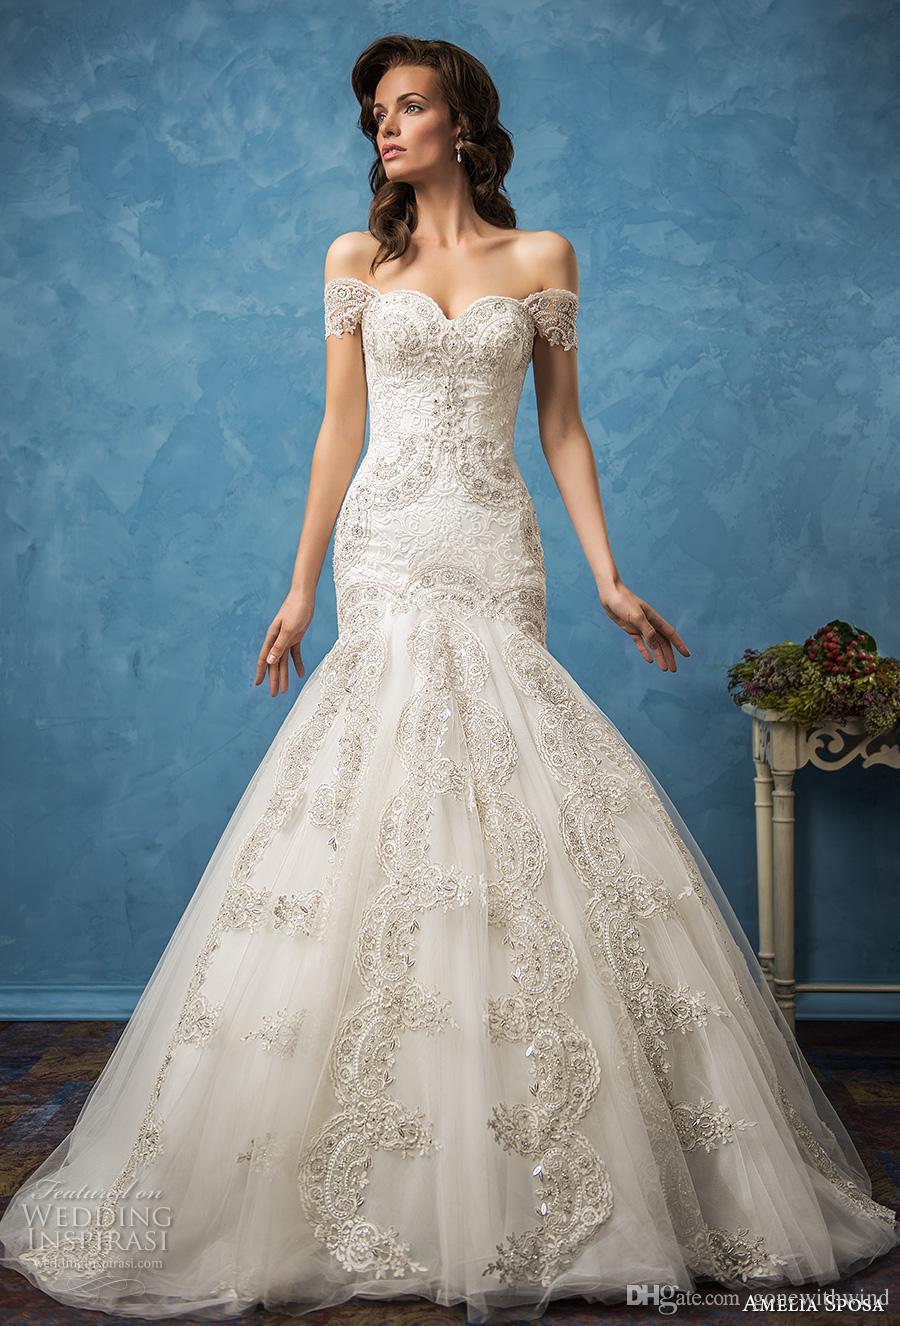 Mermaid Wedding Dresses 2017 Amelia Sposa Bridal Gowns Lace ...